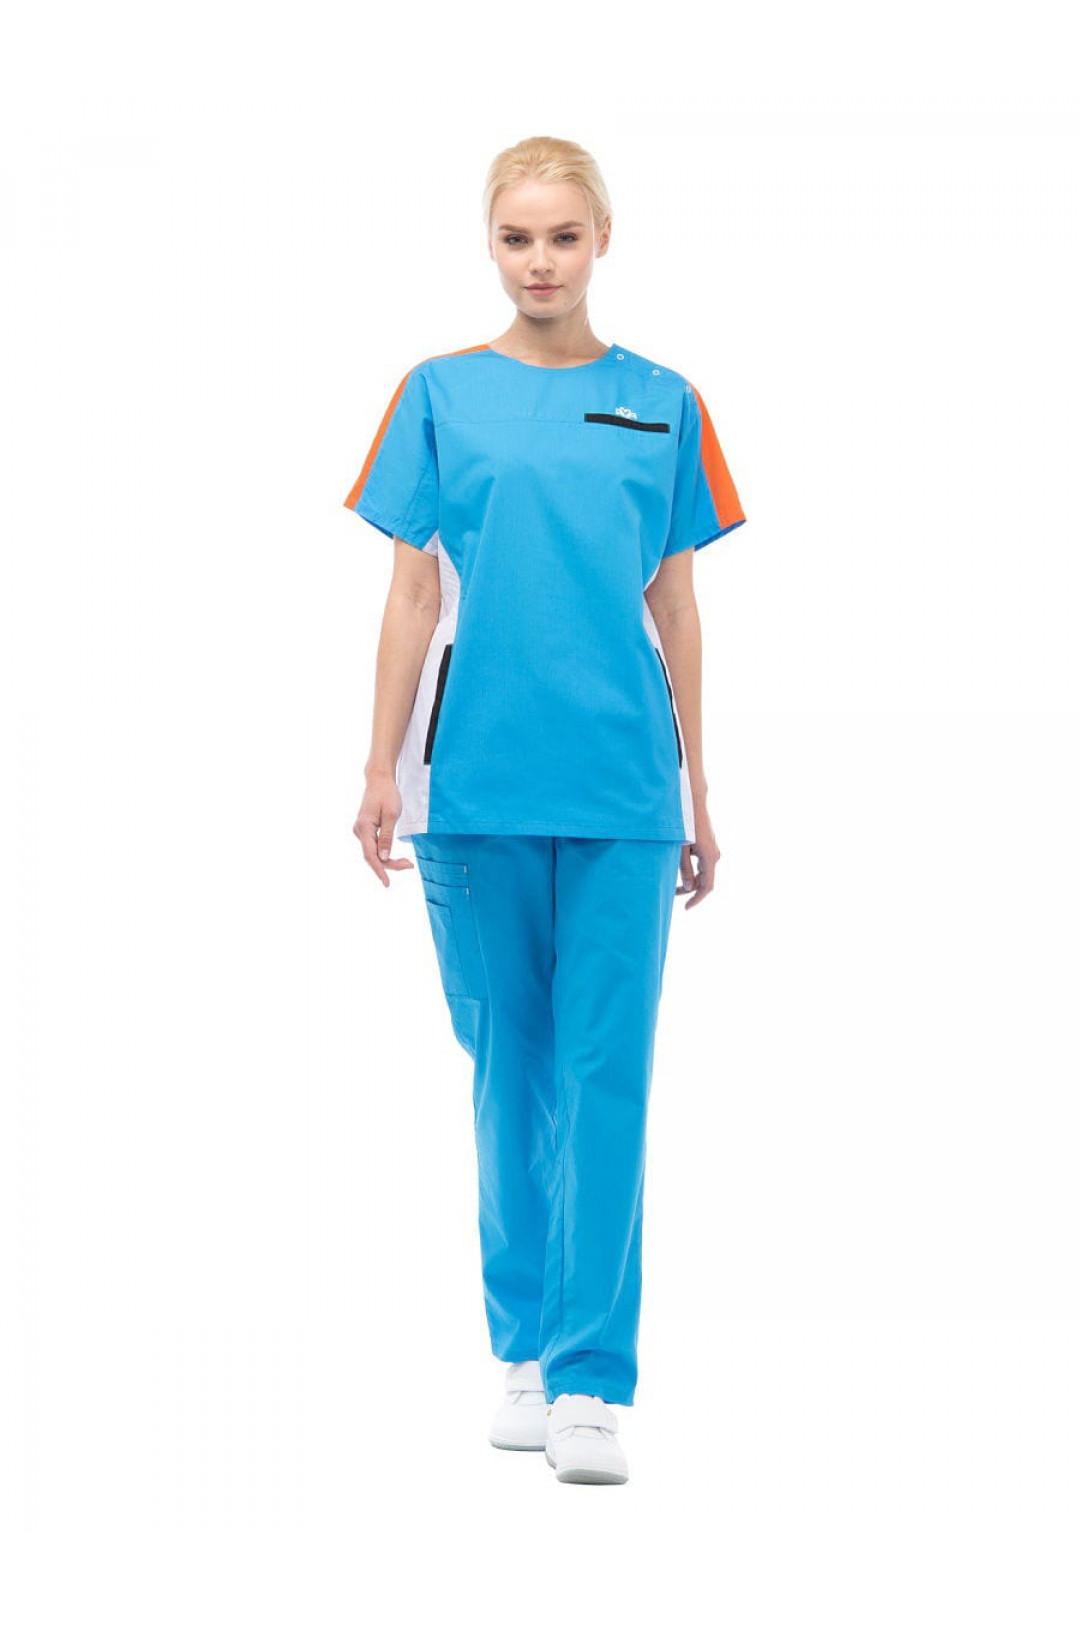 Костюм медицинский женский Аура Спорт (голубой/оранж, тиси)